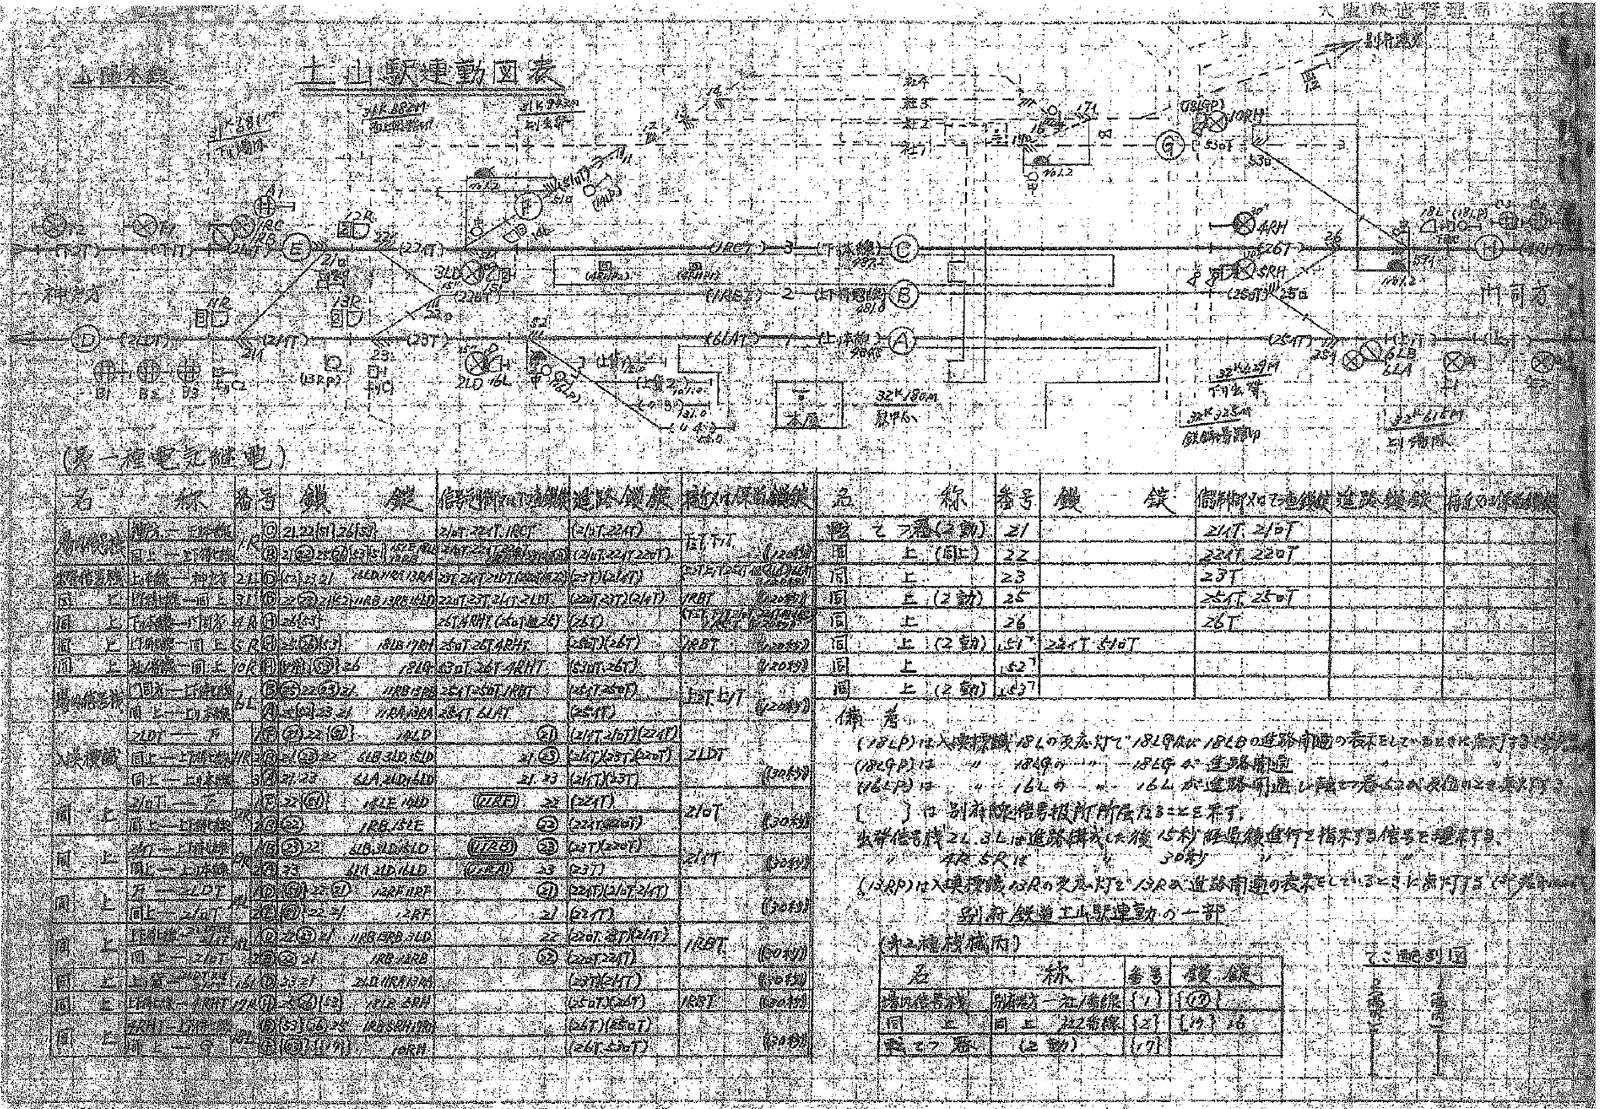 19790830r